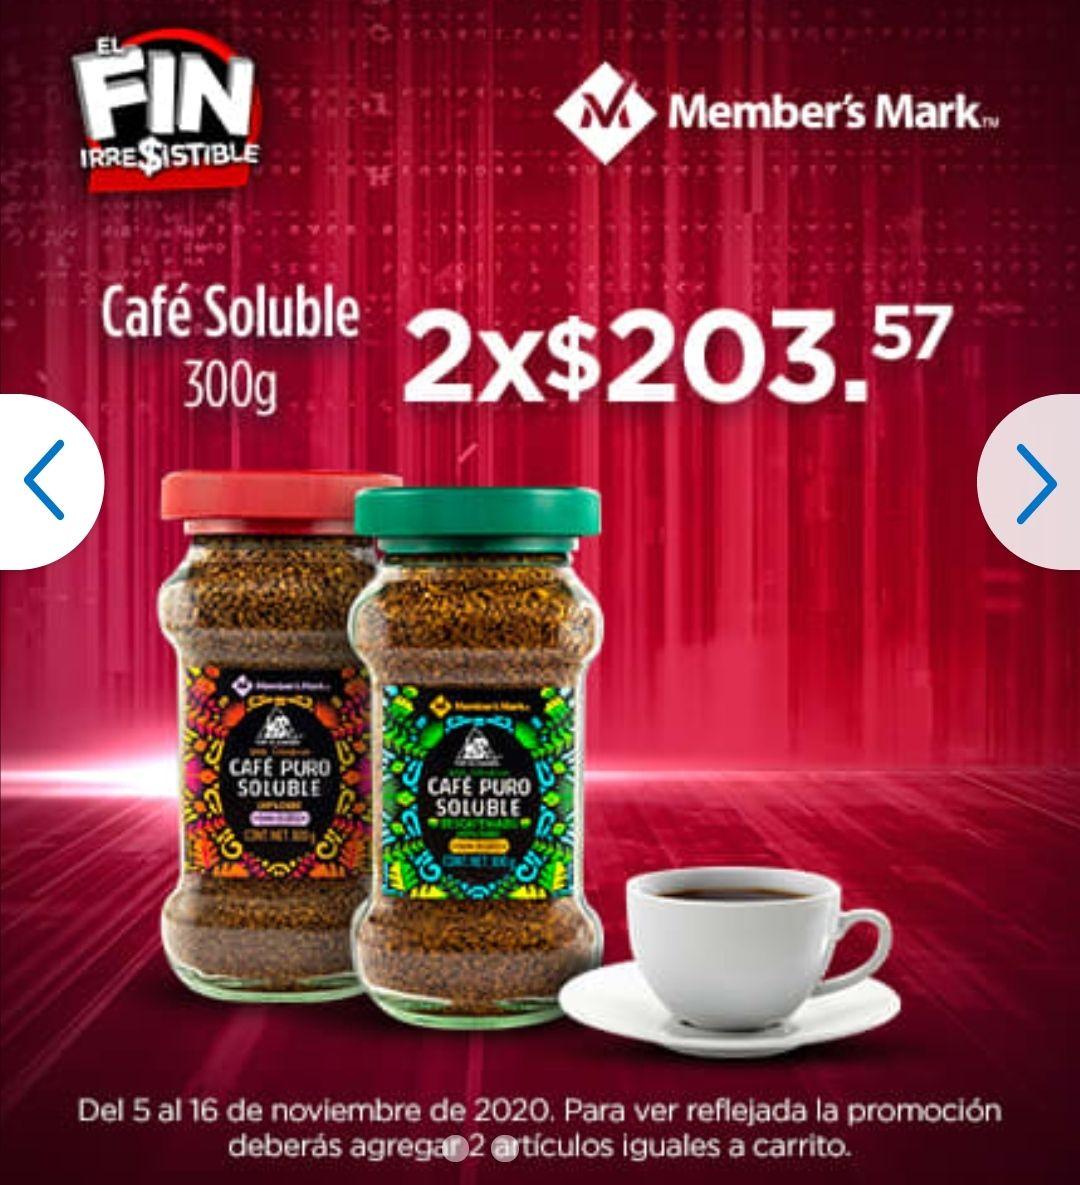 Sam's Club: Café Soluble Member's Mark 300 g (Con cafeína o descafeinado)   ENVIO: Gratis o Club Pick Up   2 piezas iguales x $203.58